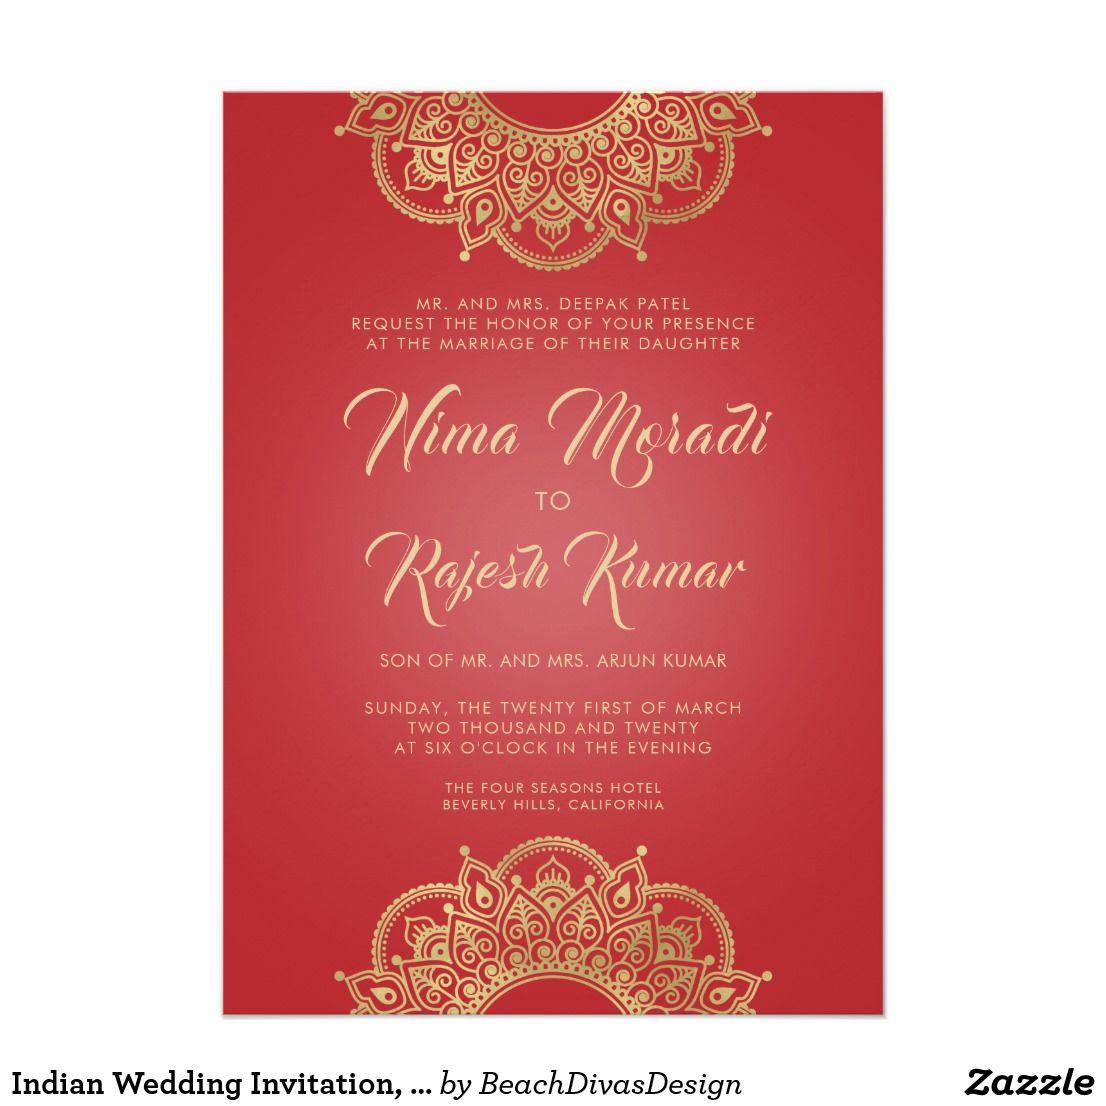 Indian Wedding Invitation, Red, Gold, Mandala Invitation | Indian ...